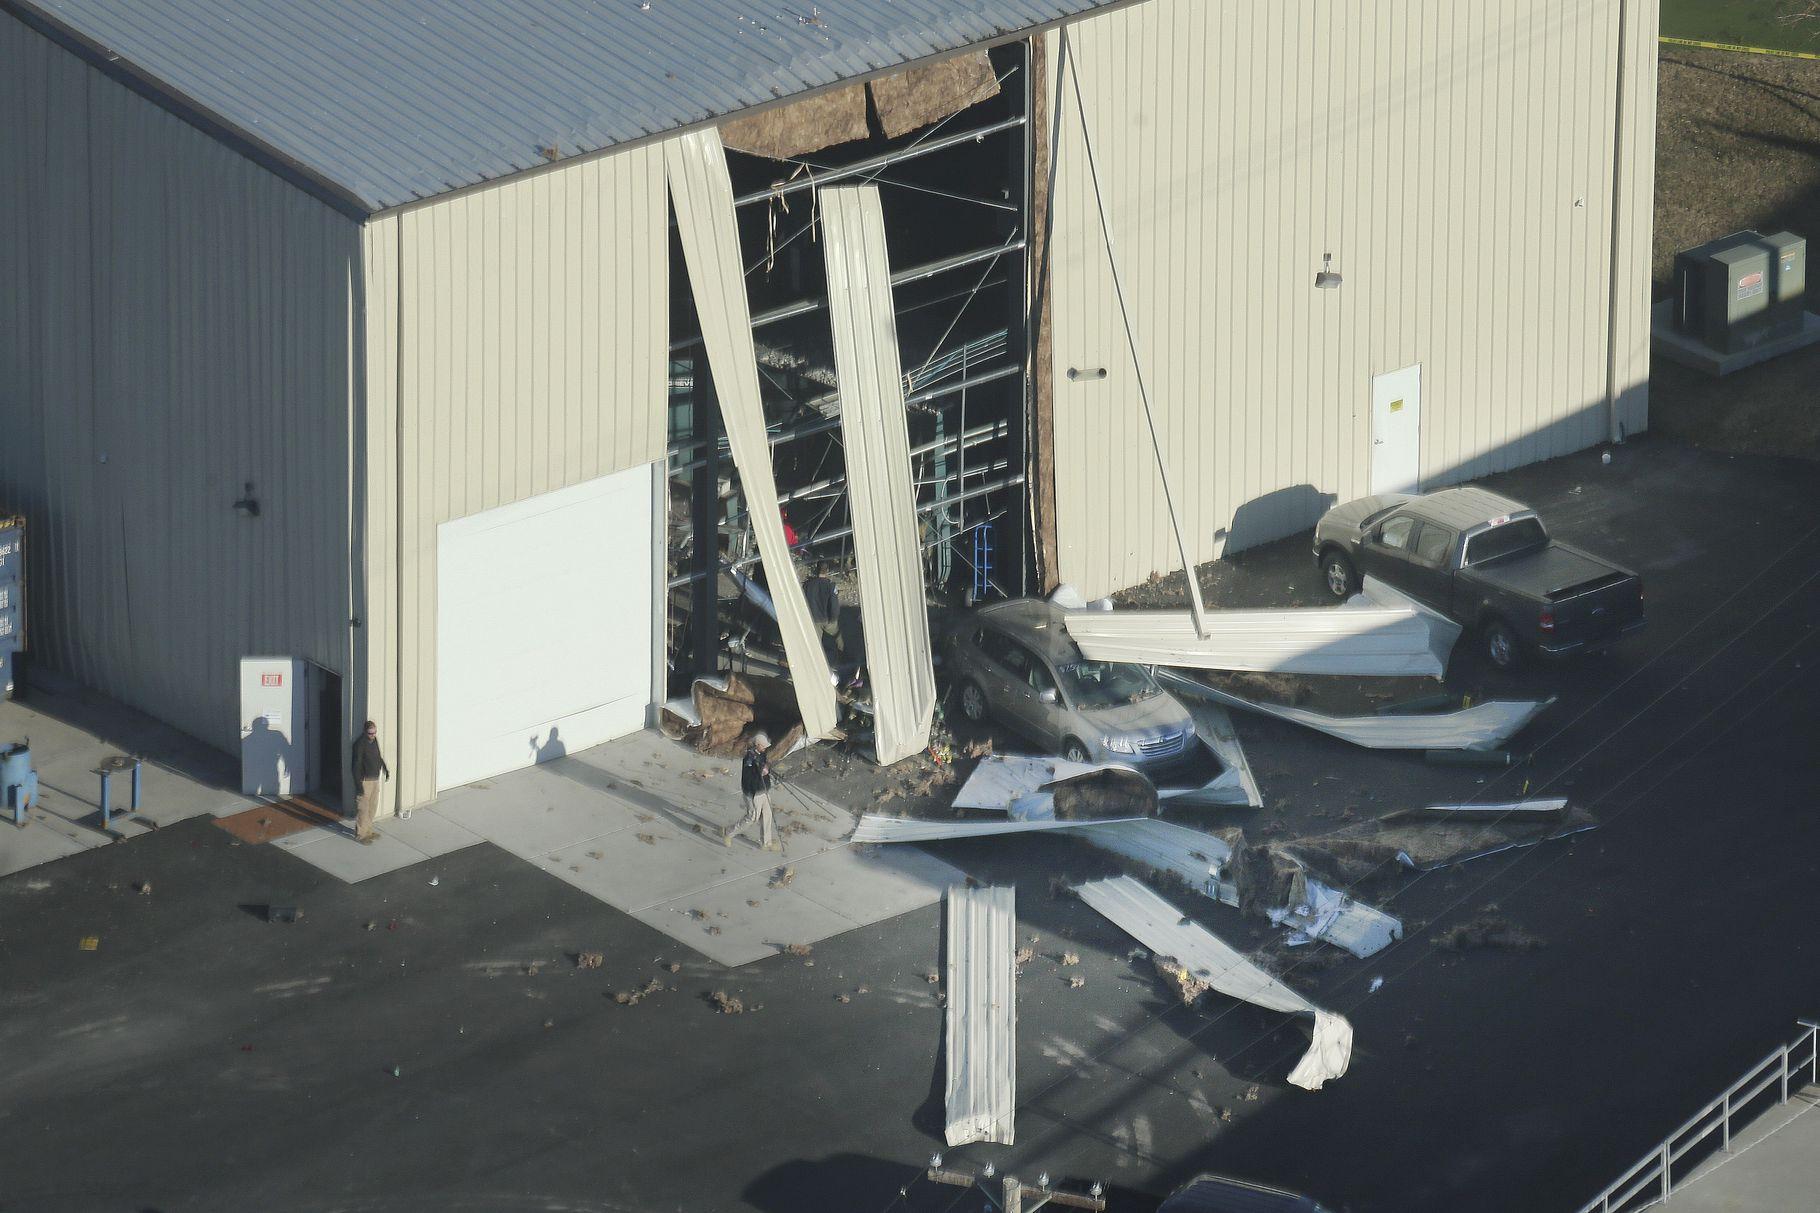 Brigham City warehouse explosion kills man